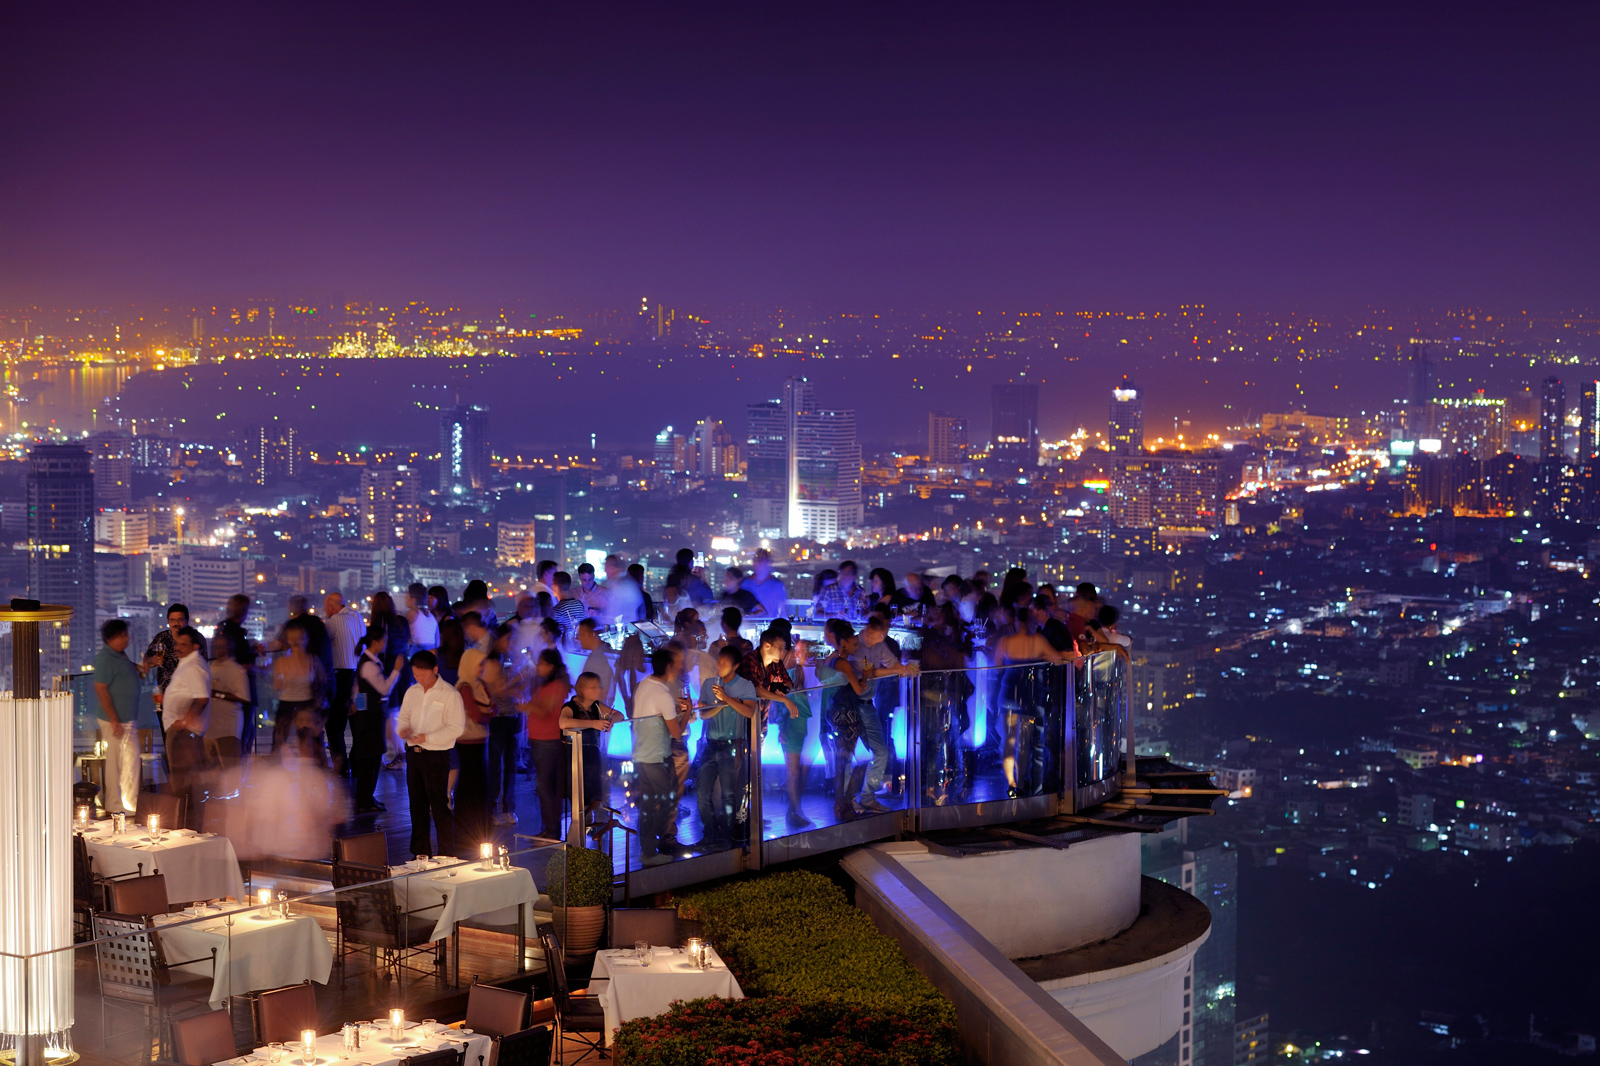 Sky bar - the world's highest open air bar and restaurant